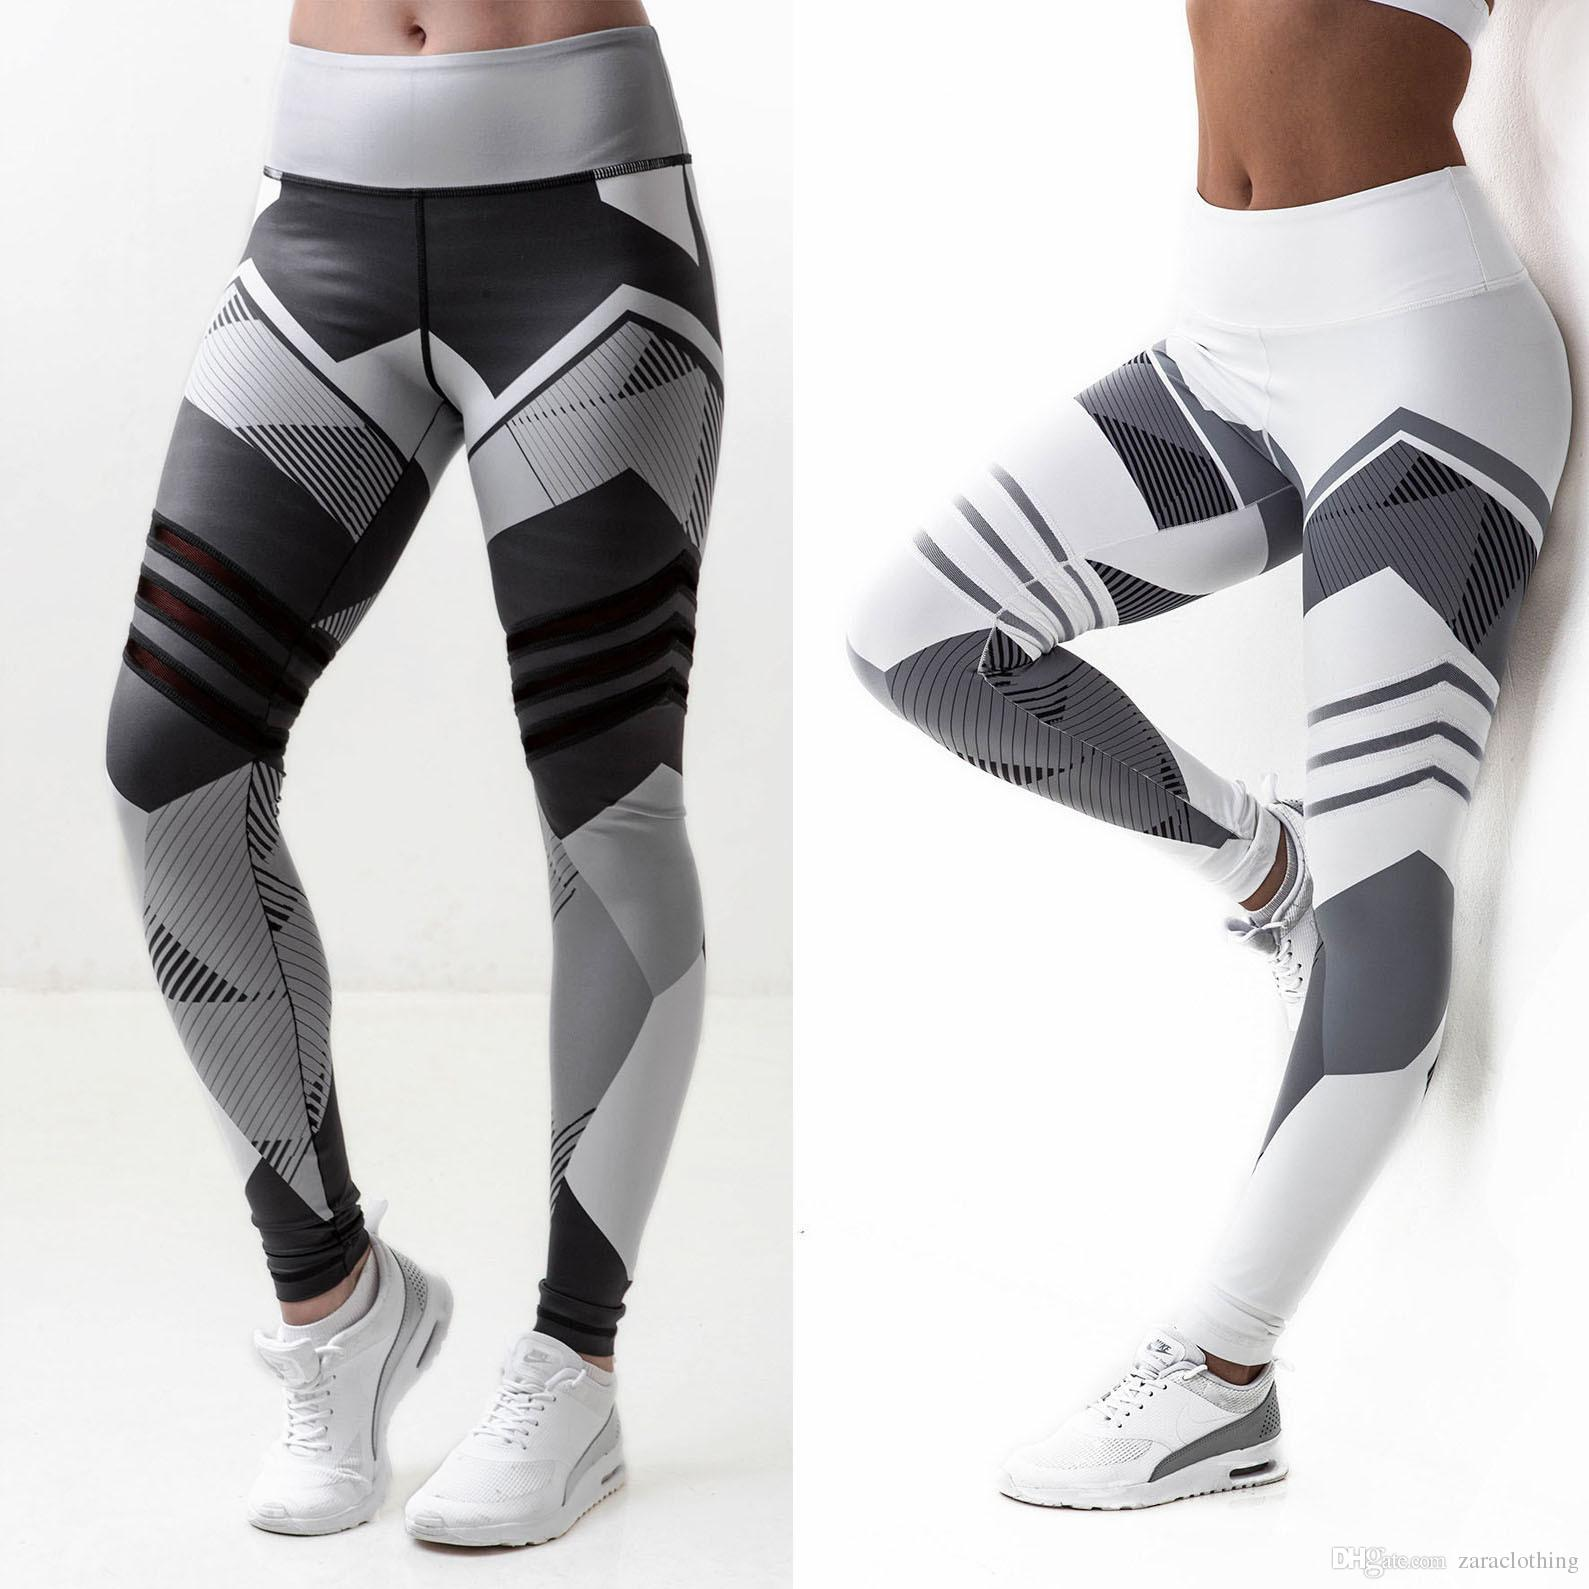 4b21f0a5918cf3 2019 2018 NEW Hot Sale Women Leggings High Elastic Leggings Printing Women  Fitness Legging Push Up Pants Clothing Sporting Leggins Jegging From  Zaraclothing ...